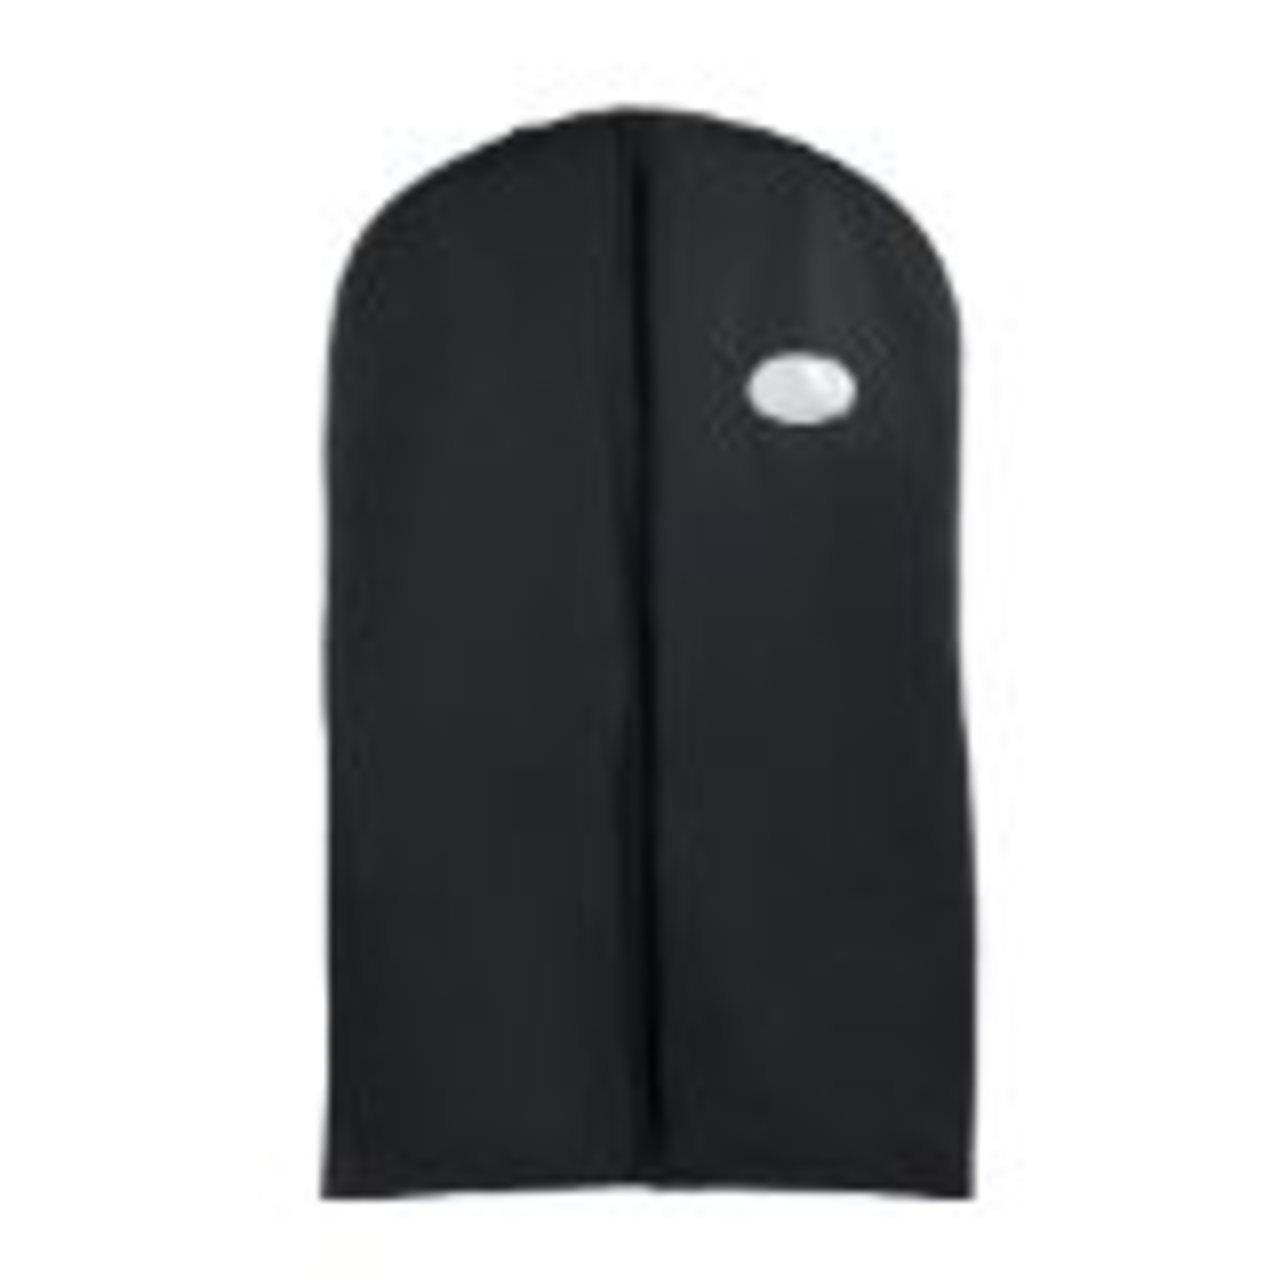 Tuva Vinyl Gown//dress Garment Bag Black By Tuva Inc. 10 Pack 66